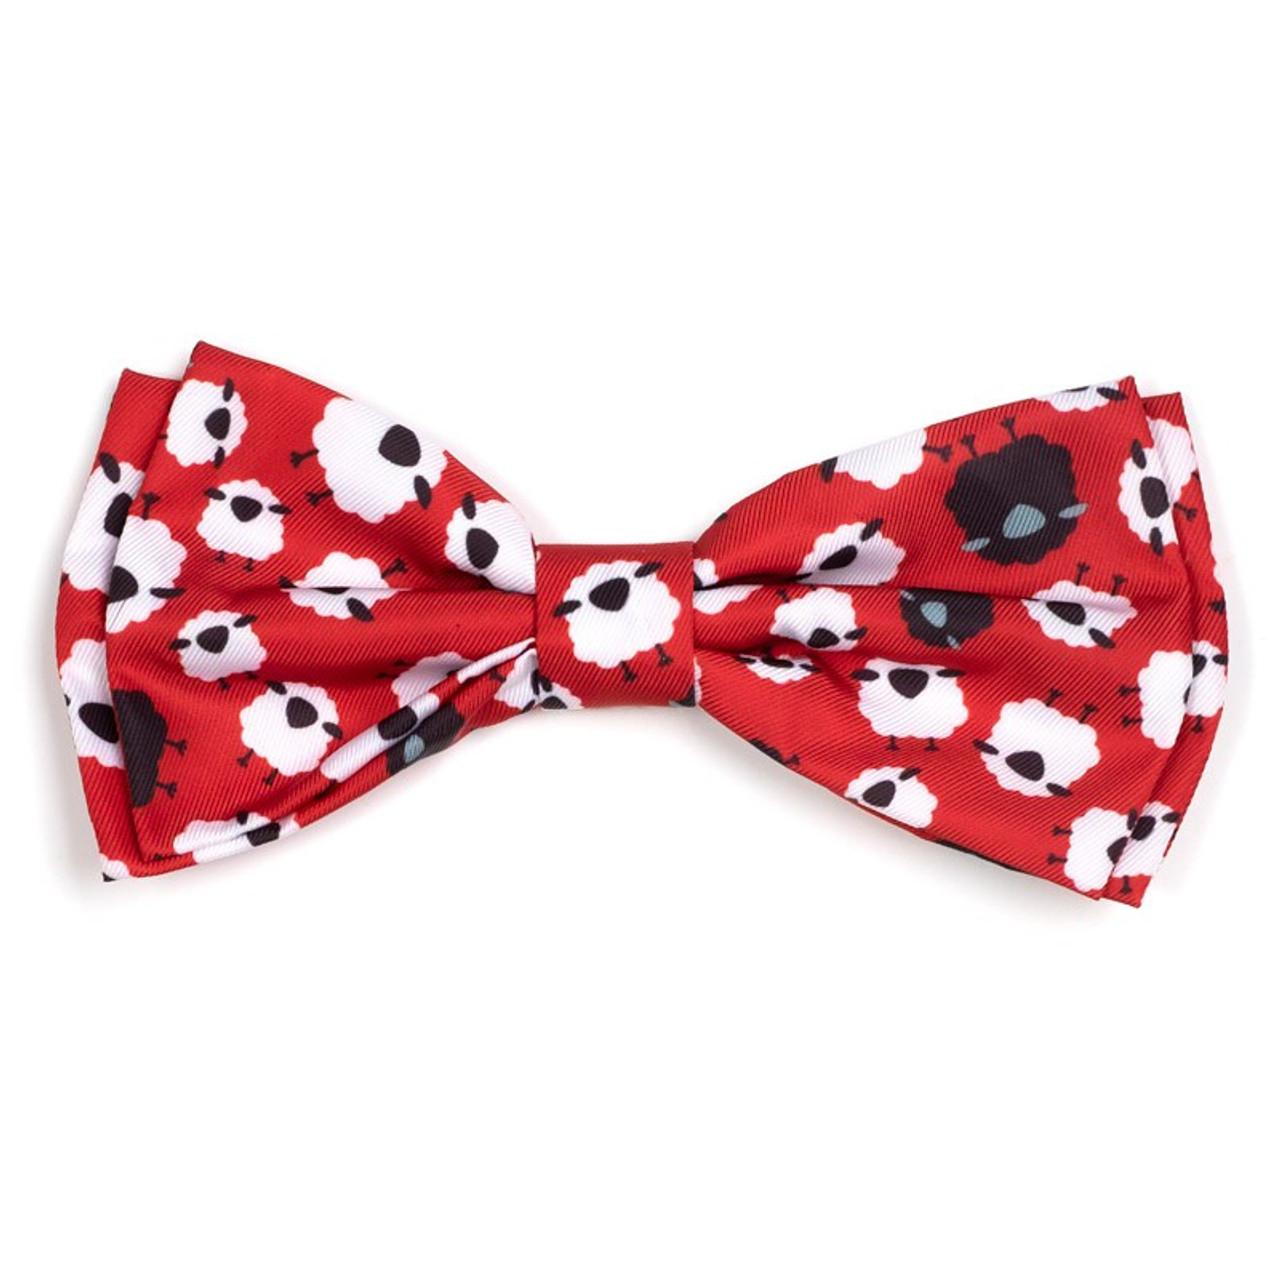 The Worthy Dog Bow Tie